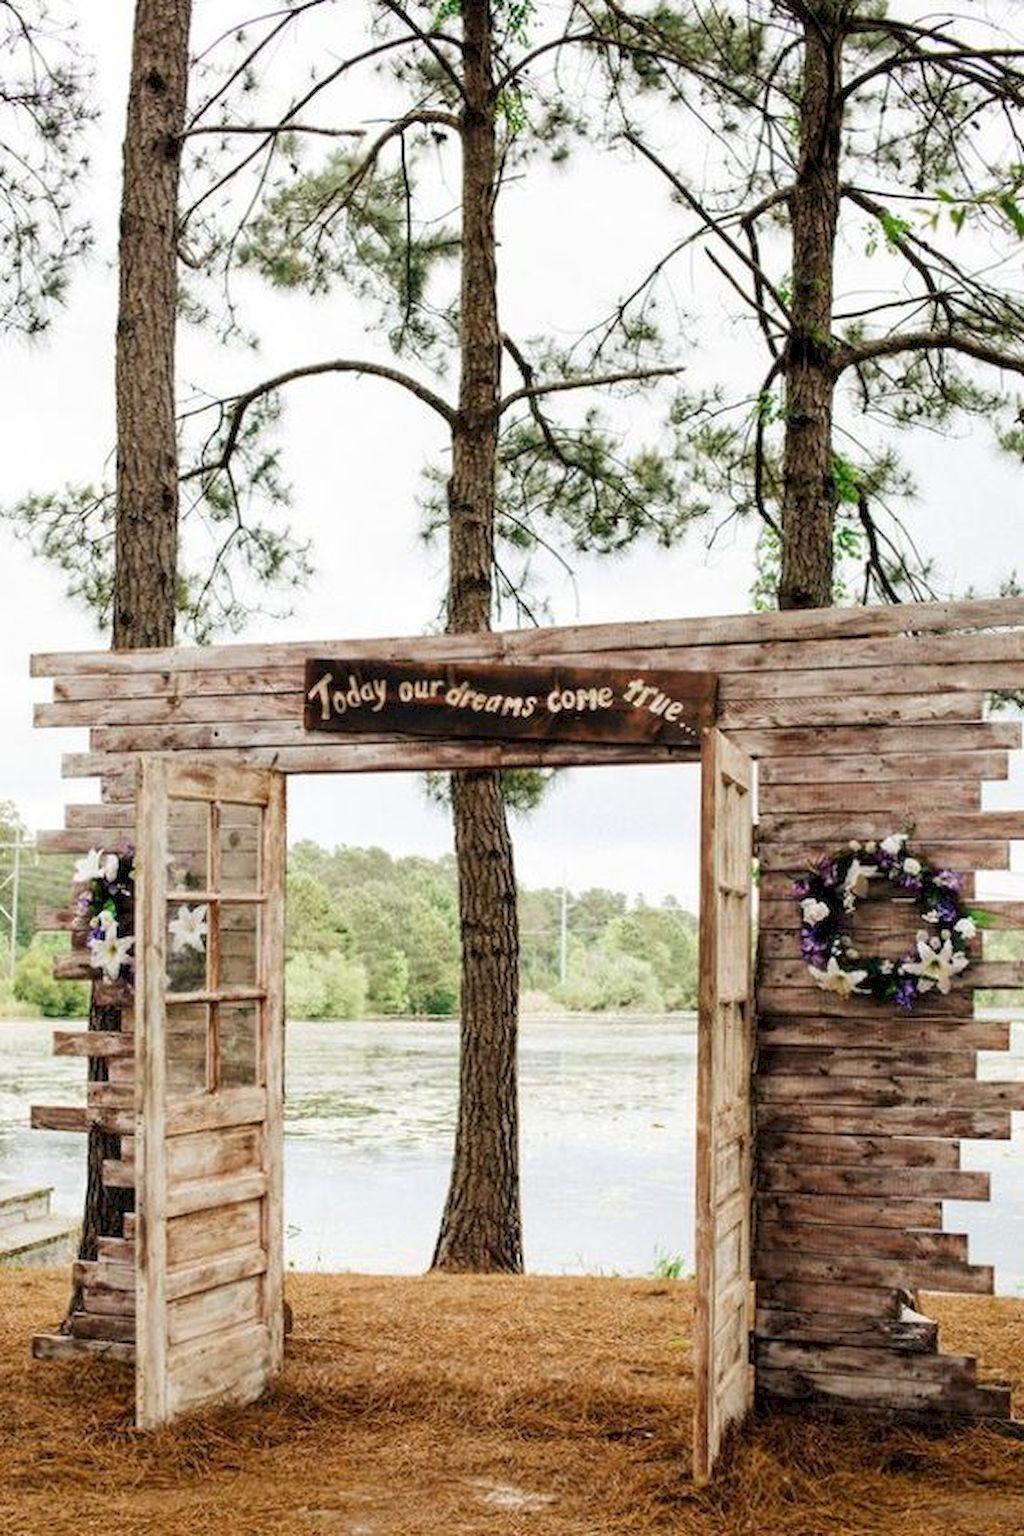 Wedding lawn decoration ideas  Pin by Janlyn Jerome on Planninu for a Weddinu in   Pinterest